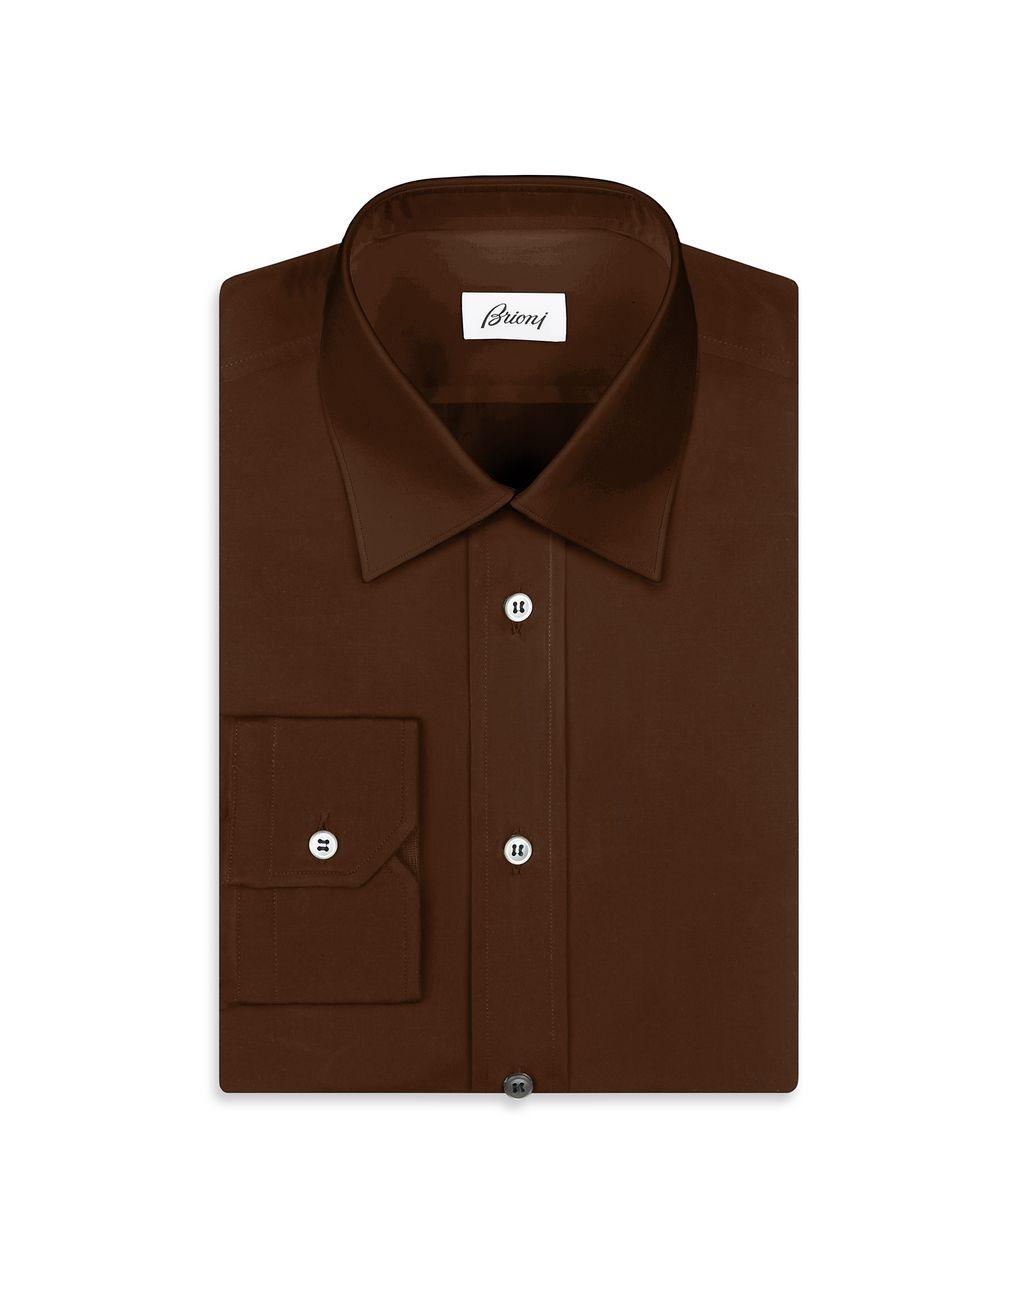 BRIONI Коричневая Рубашка Повседневная рубашка Для Мужчин f